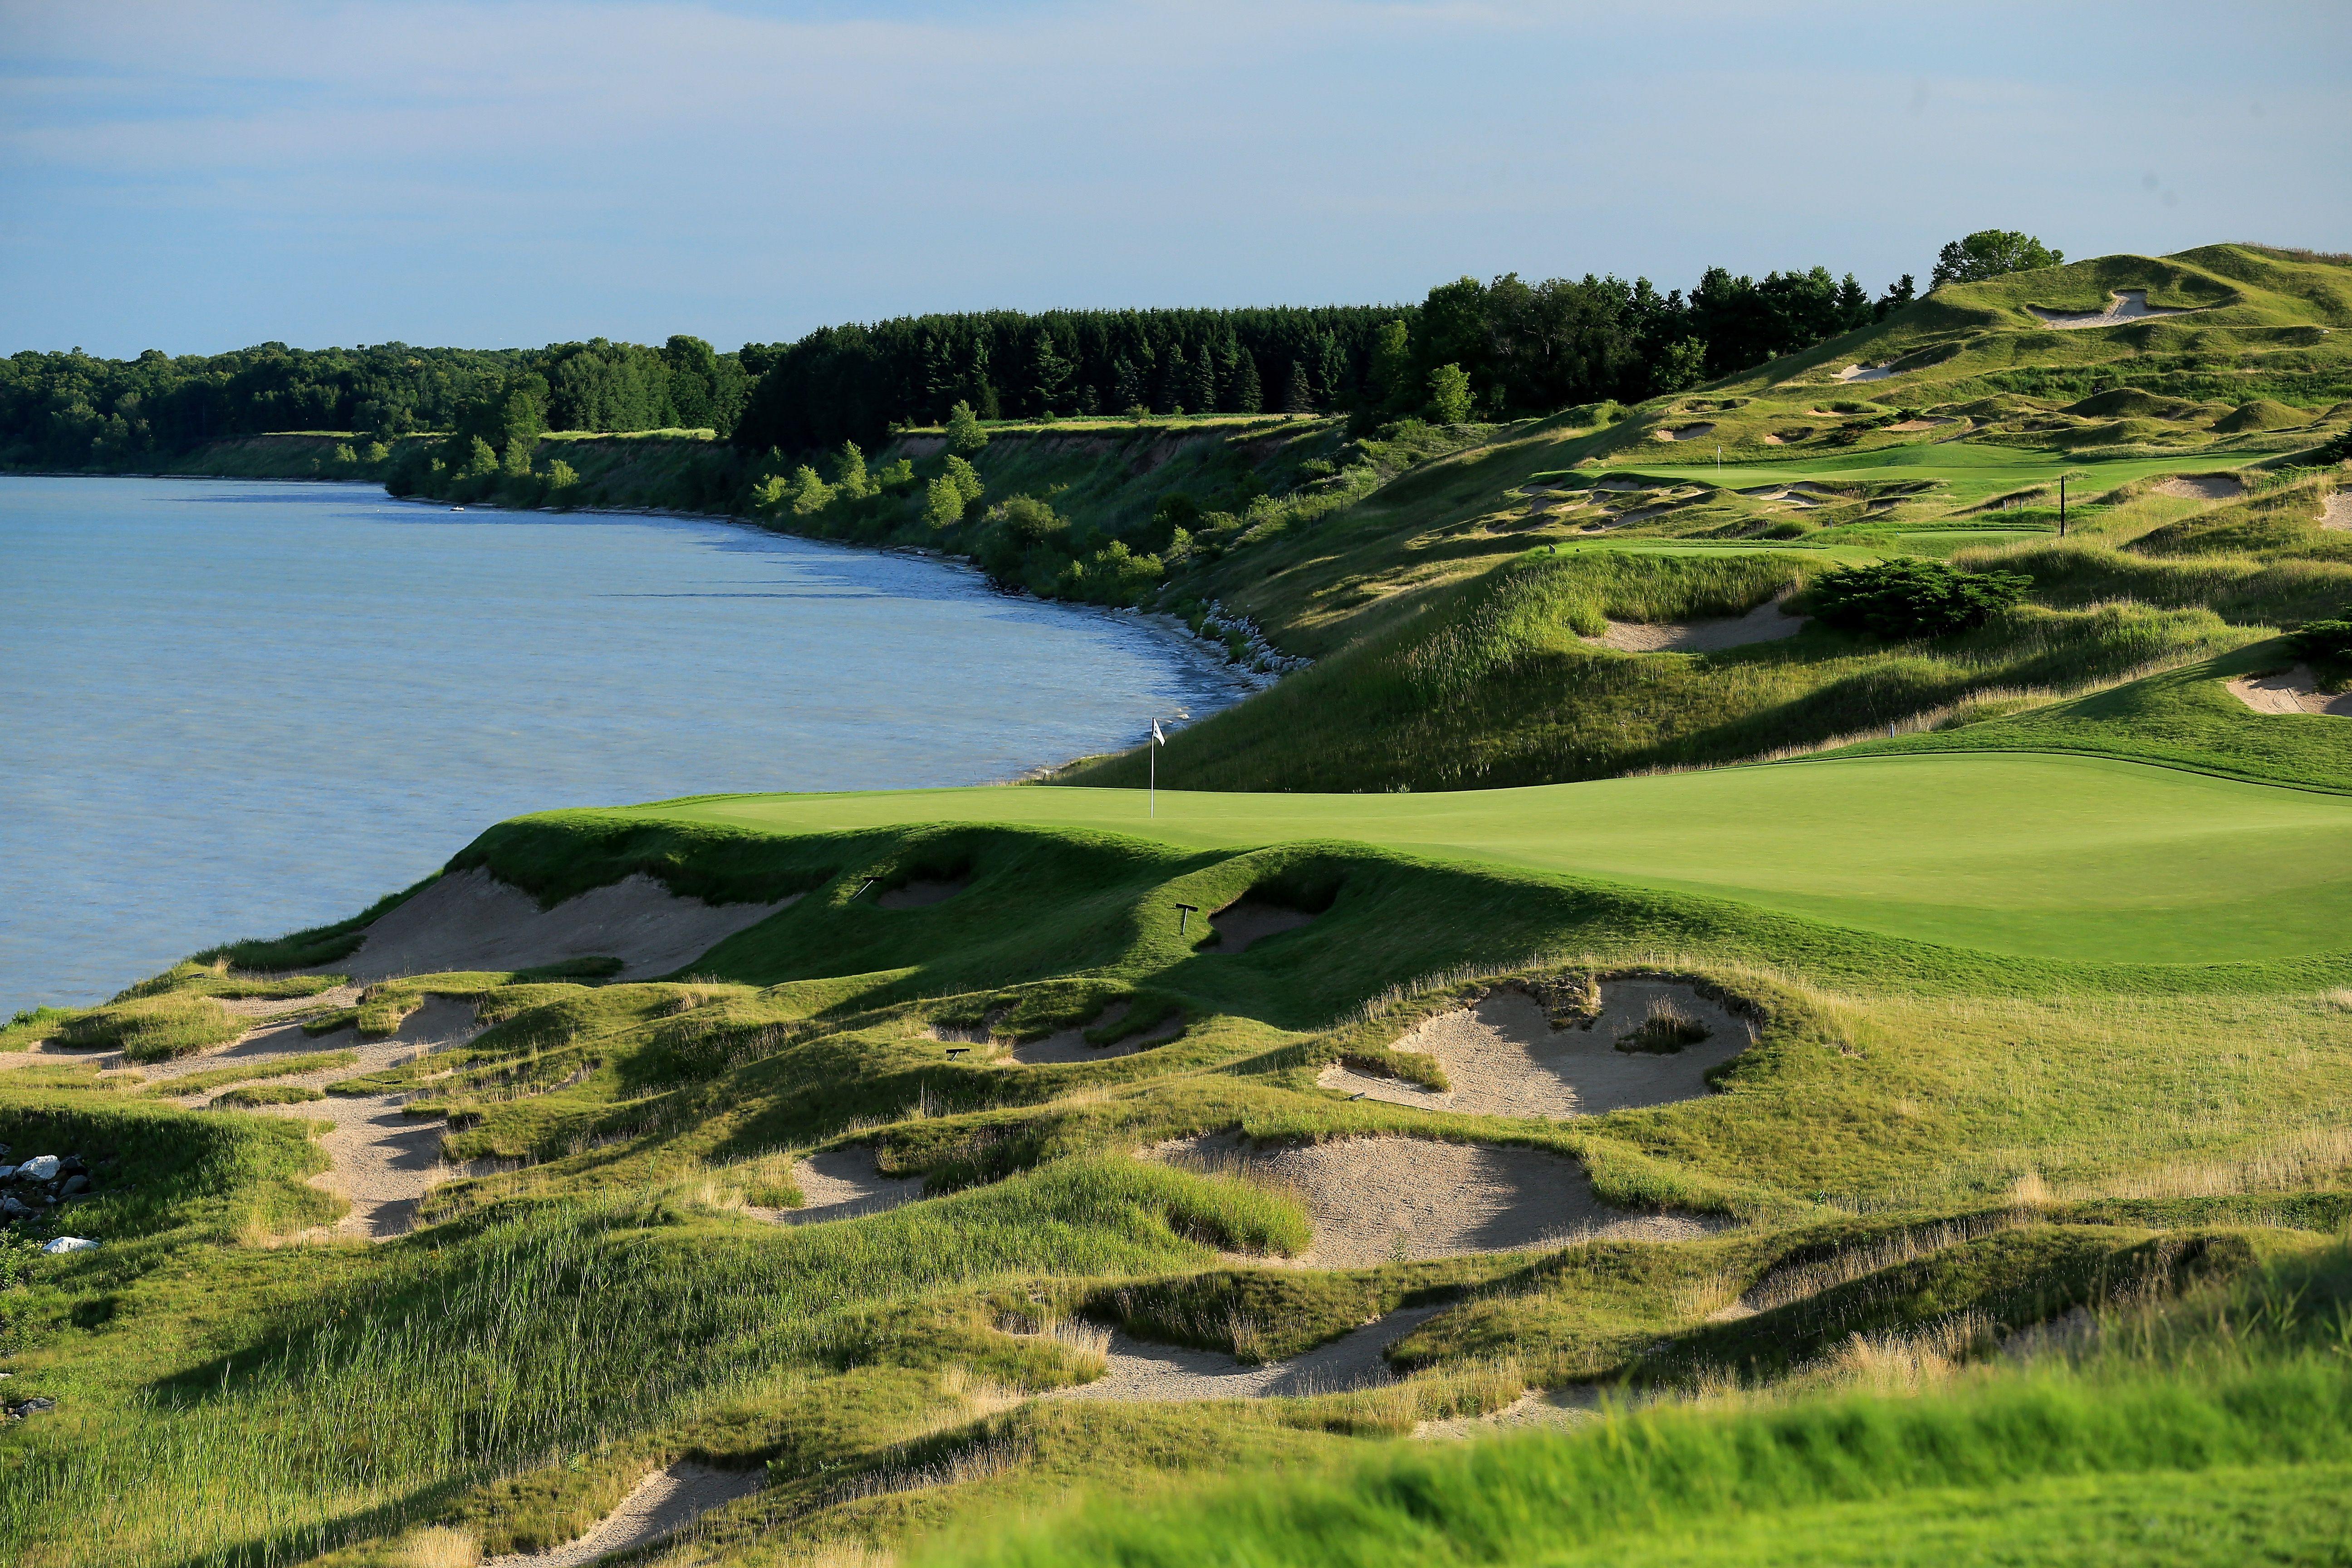 PGA Championship Golf Courses: The Full List